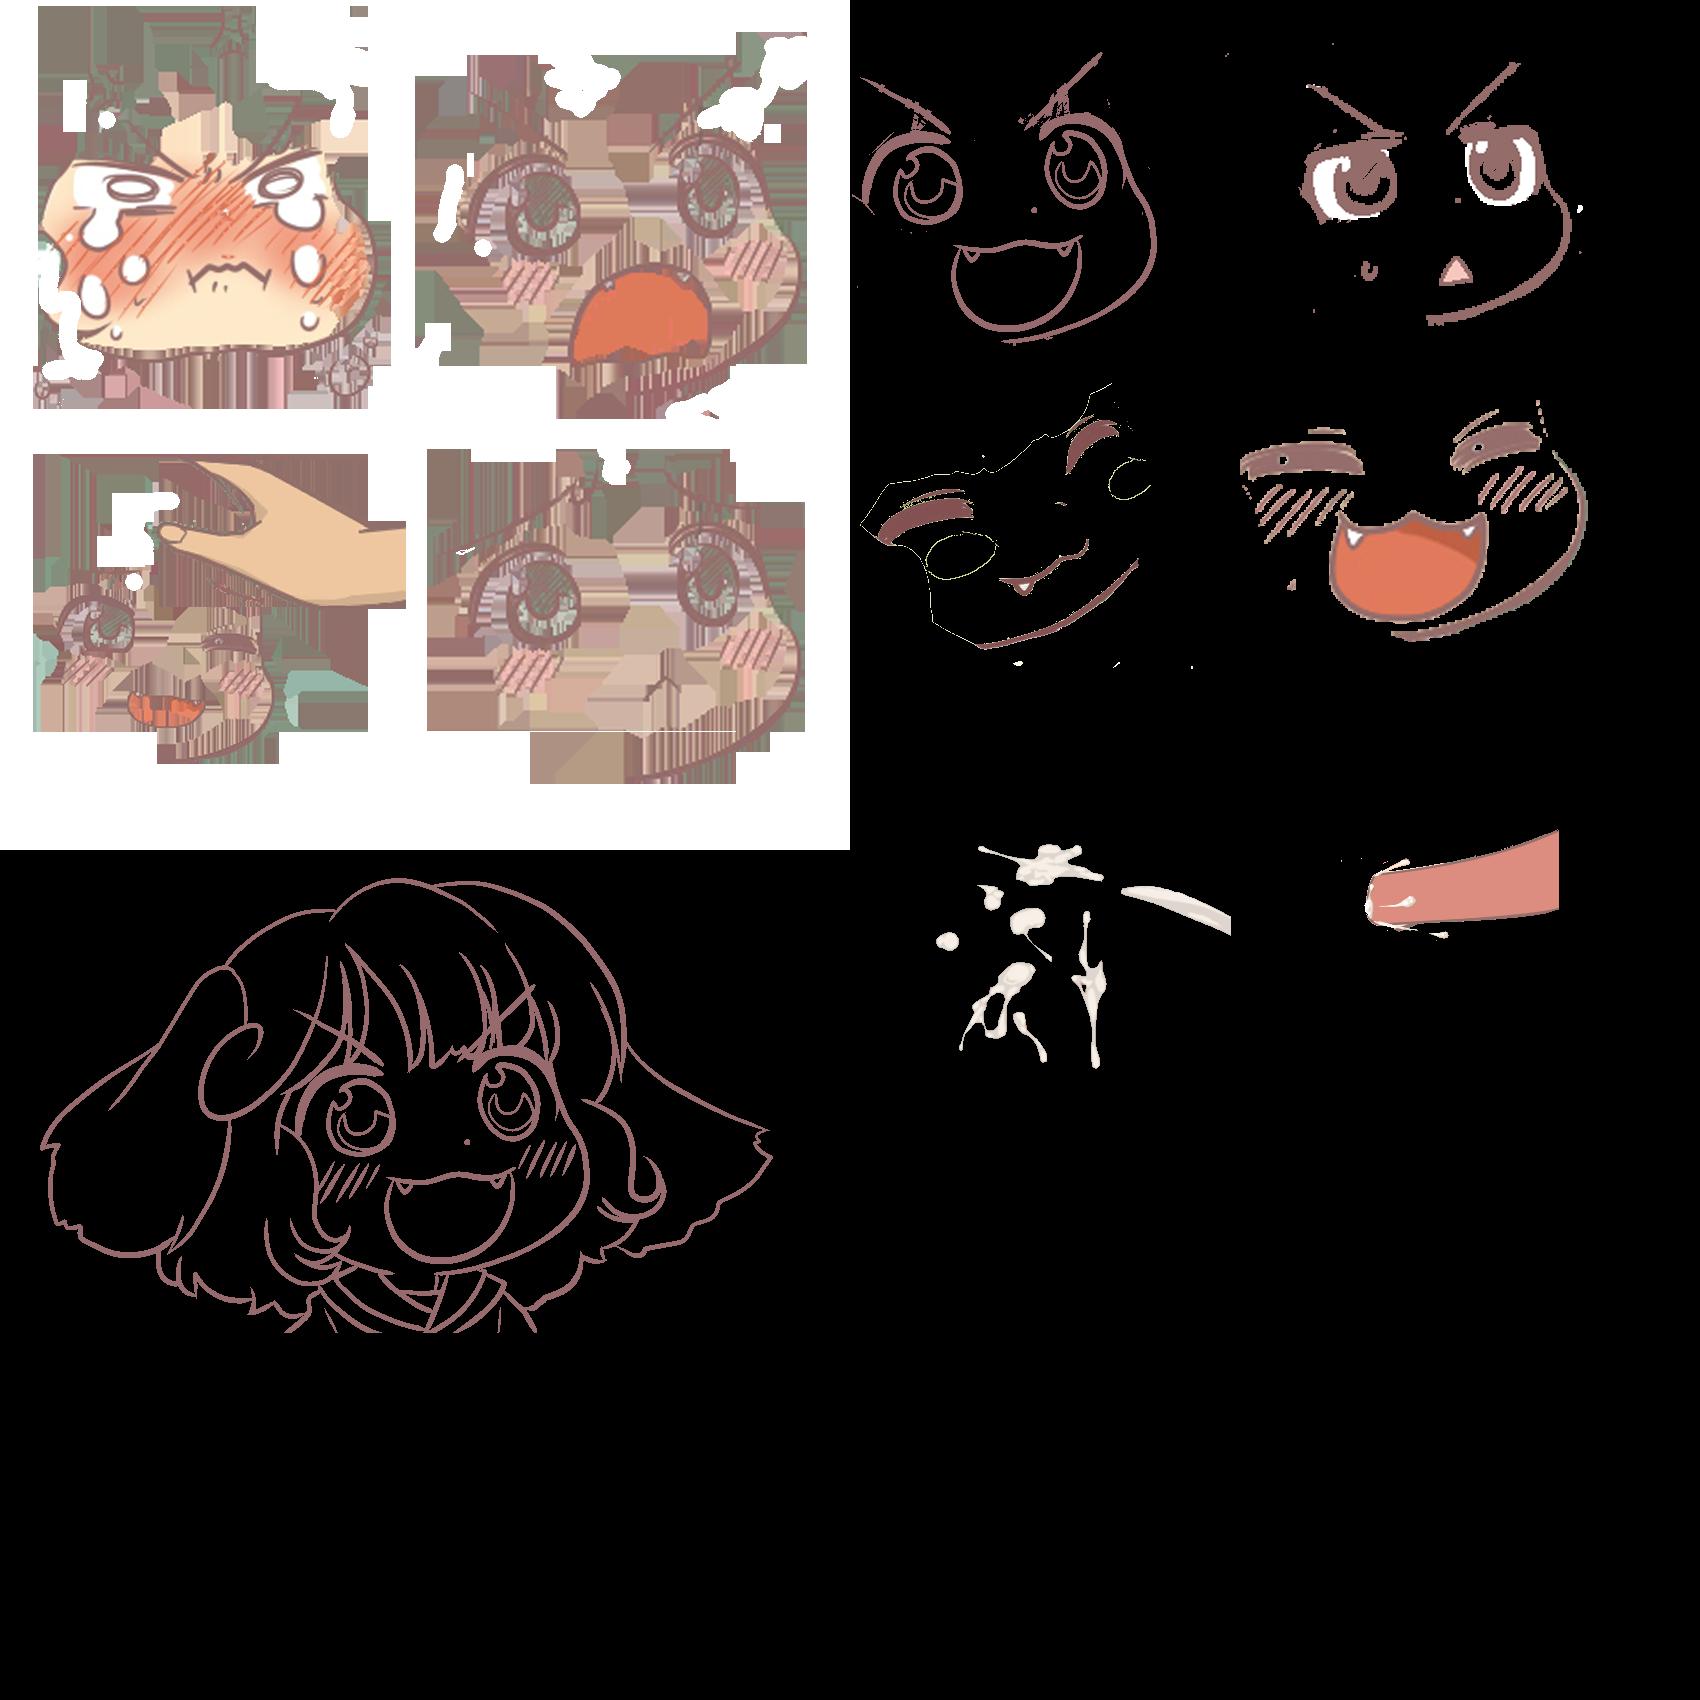 1435387521263 3 Png 1700 1700 Anime Drawings Tutorials Manga Drawing Tutorials Chibi Drawings